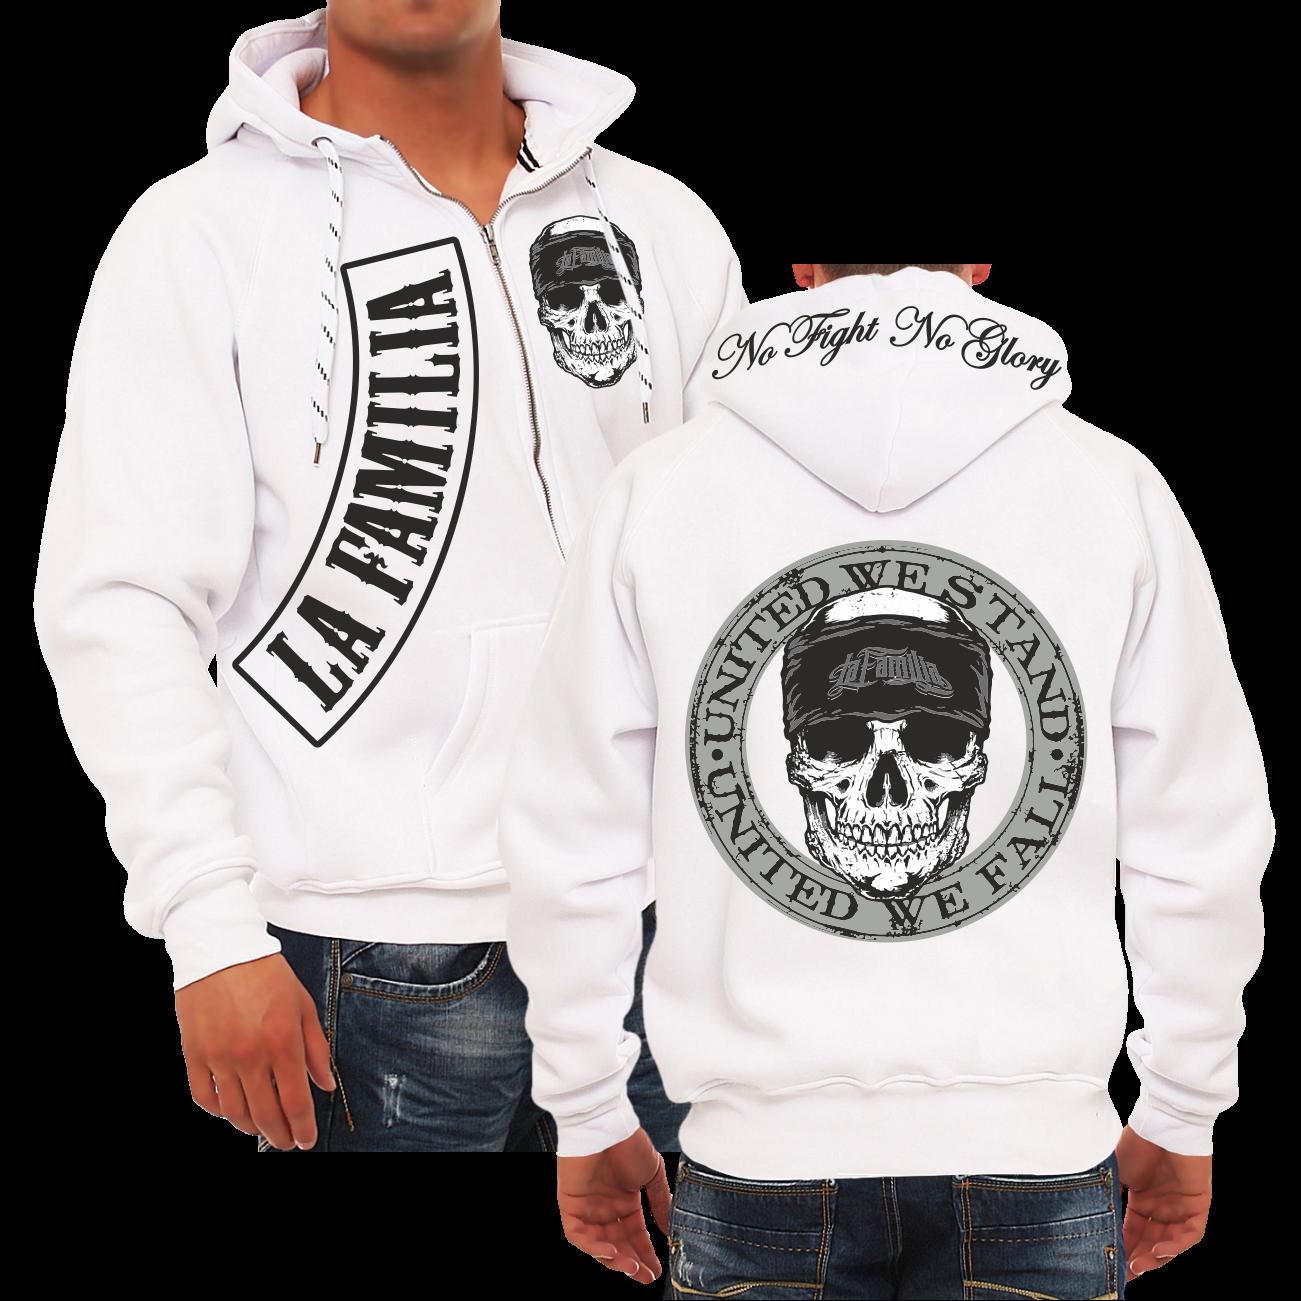 Kapuzensweat Kapuzensweat Kapuzensweat veste Hooded zip la Familia united we stand Criminal front Hardcore c9c15b